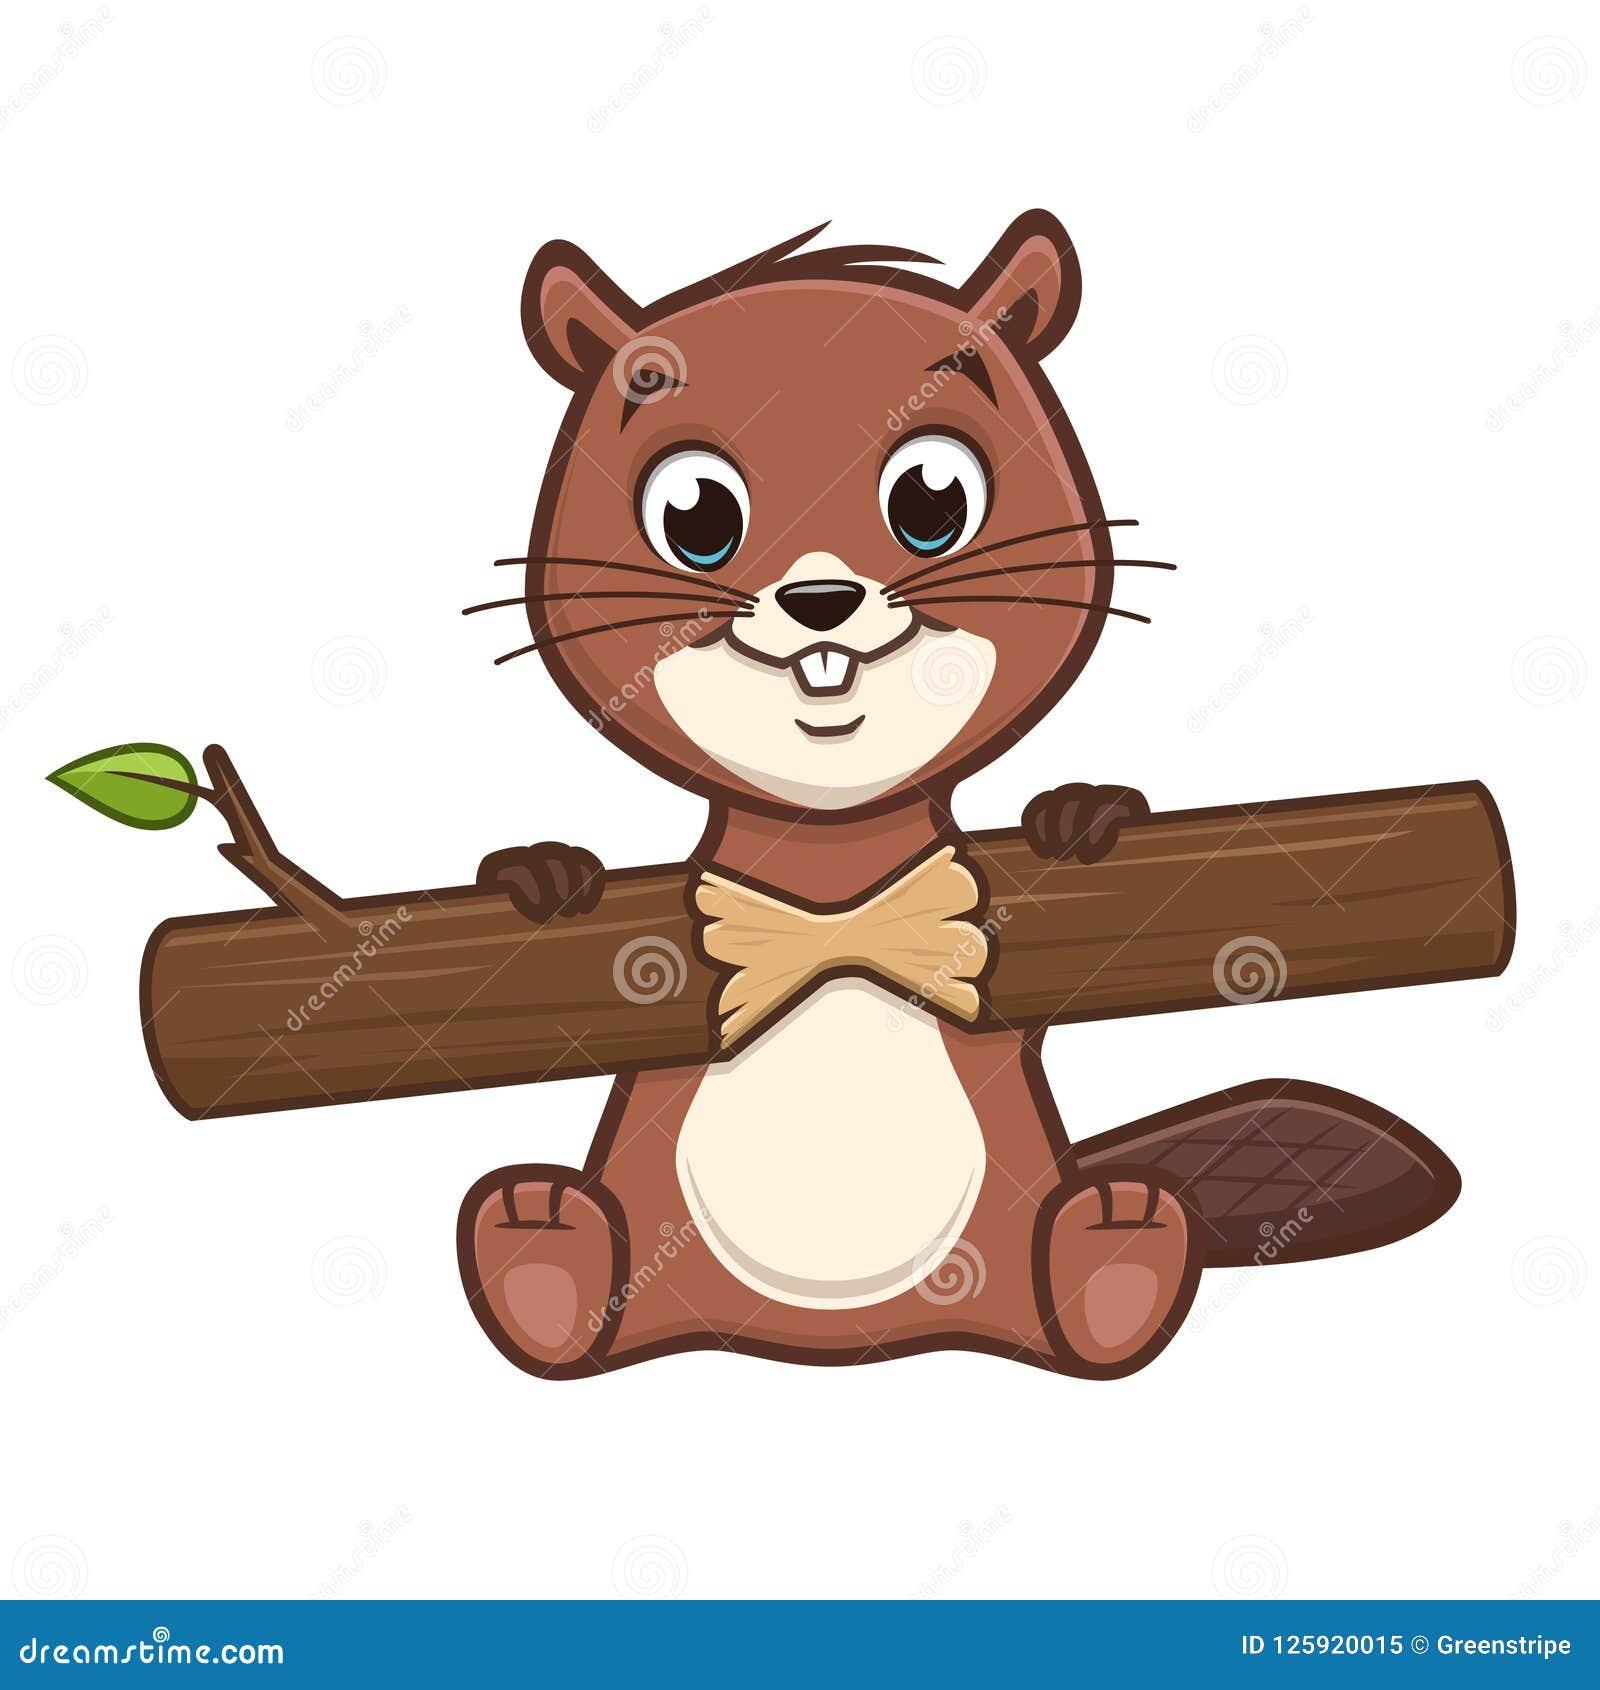 Cartoon Cute Beaver Stock Vector Illustration Of Drawing 125920015